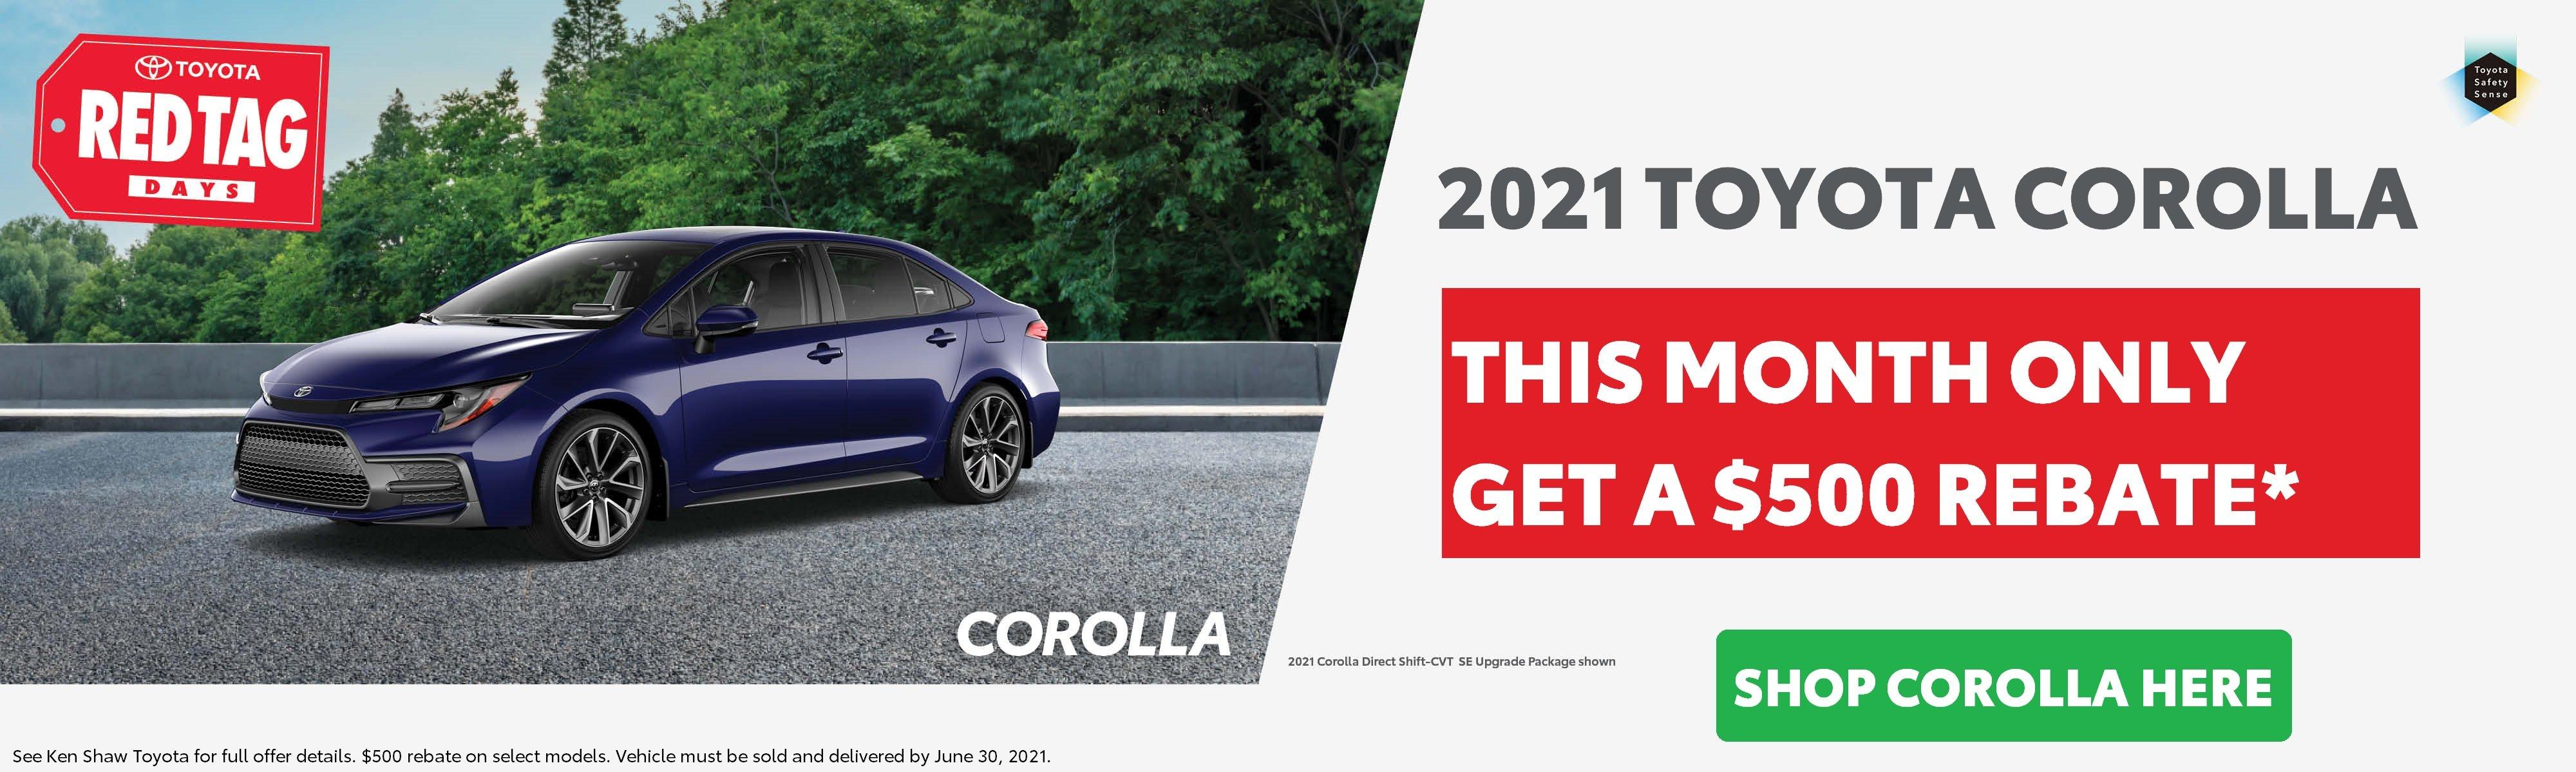 2021 Toyota Corolla on sale in Toronto at Ken Shaw Toyota $500 rebate promotion